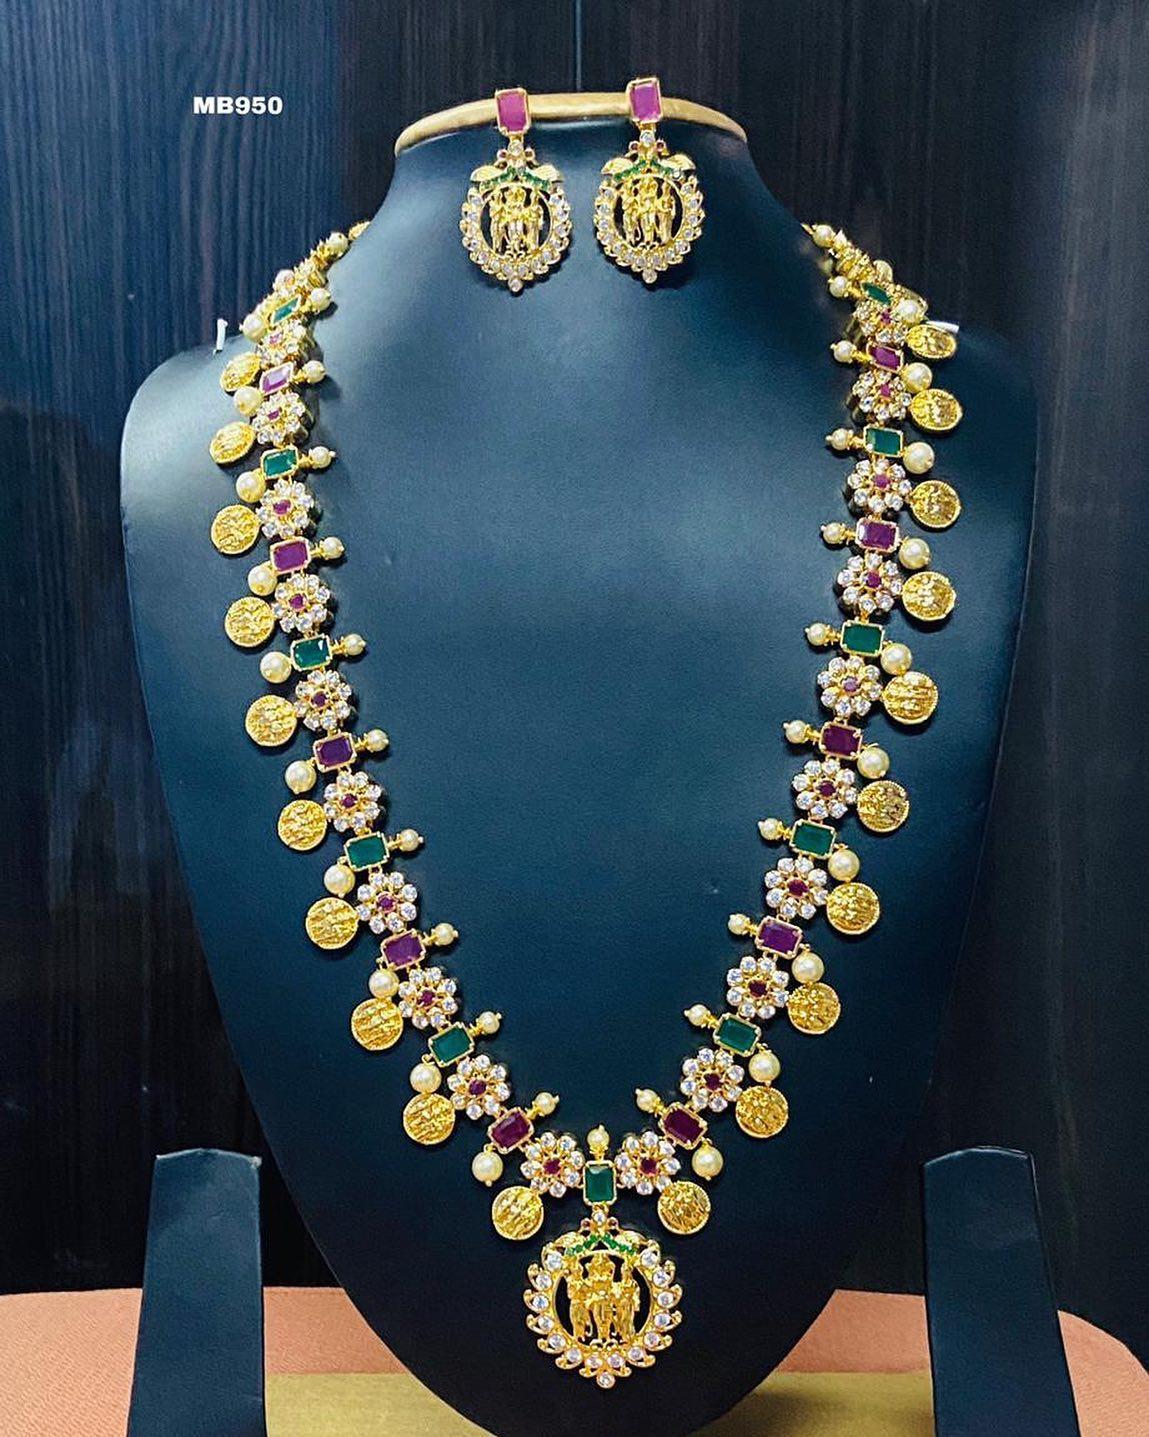 Gorgeous one gram gold Ram parivar haaram with Ram parivar pendant. 1 gram antique jewellery one gram gold haram 1gm gold jewellery with price